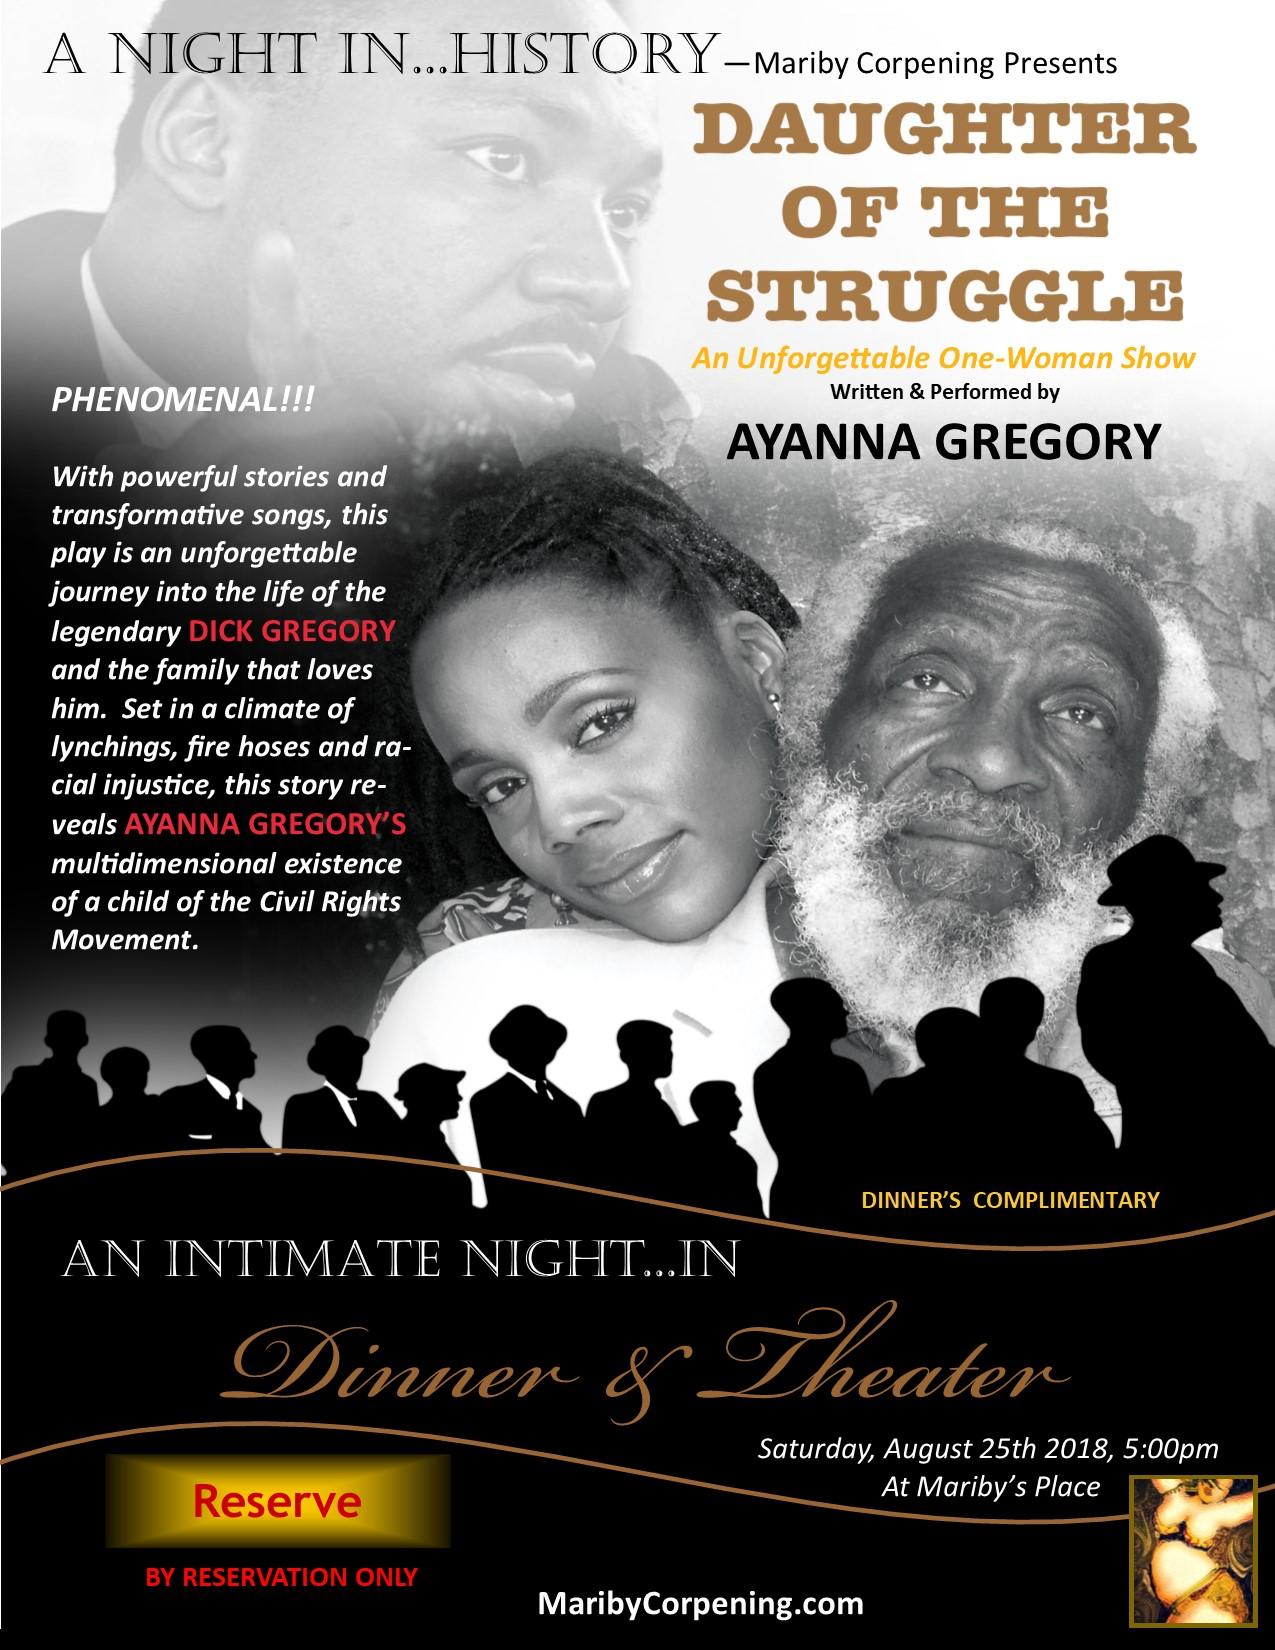 Flyer - Mariby Corpening's Dinner & Theater.jpg